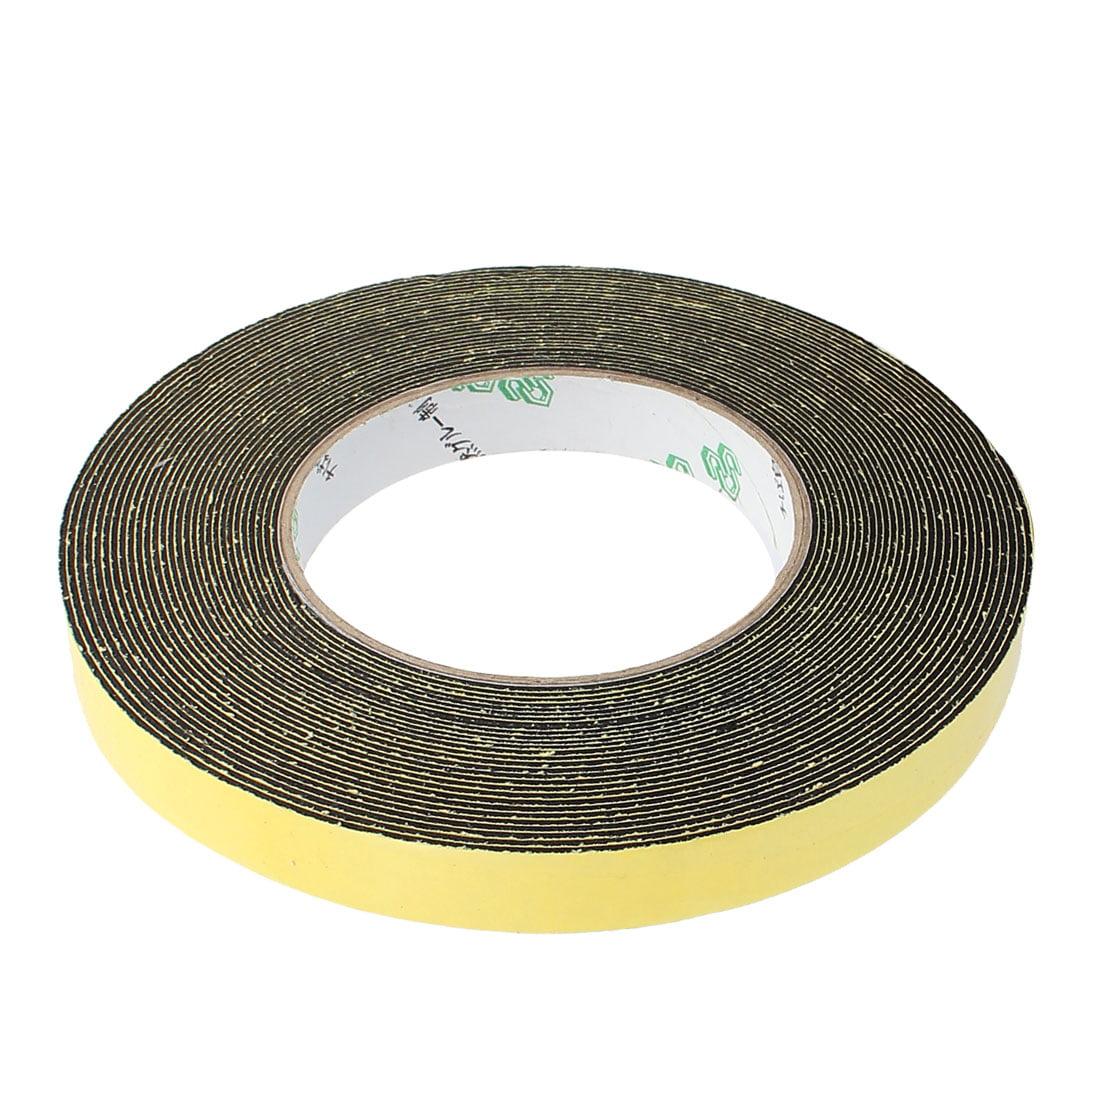 2Pcs 15mm Width 1mm Thickness Single Side Sponge Foam Tape Black 10 Meter Length - image 3 of 4